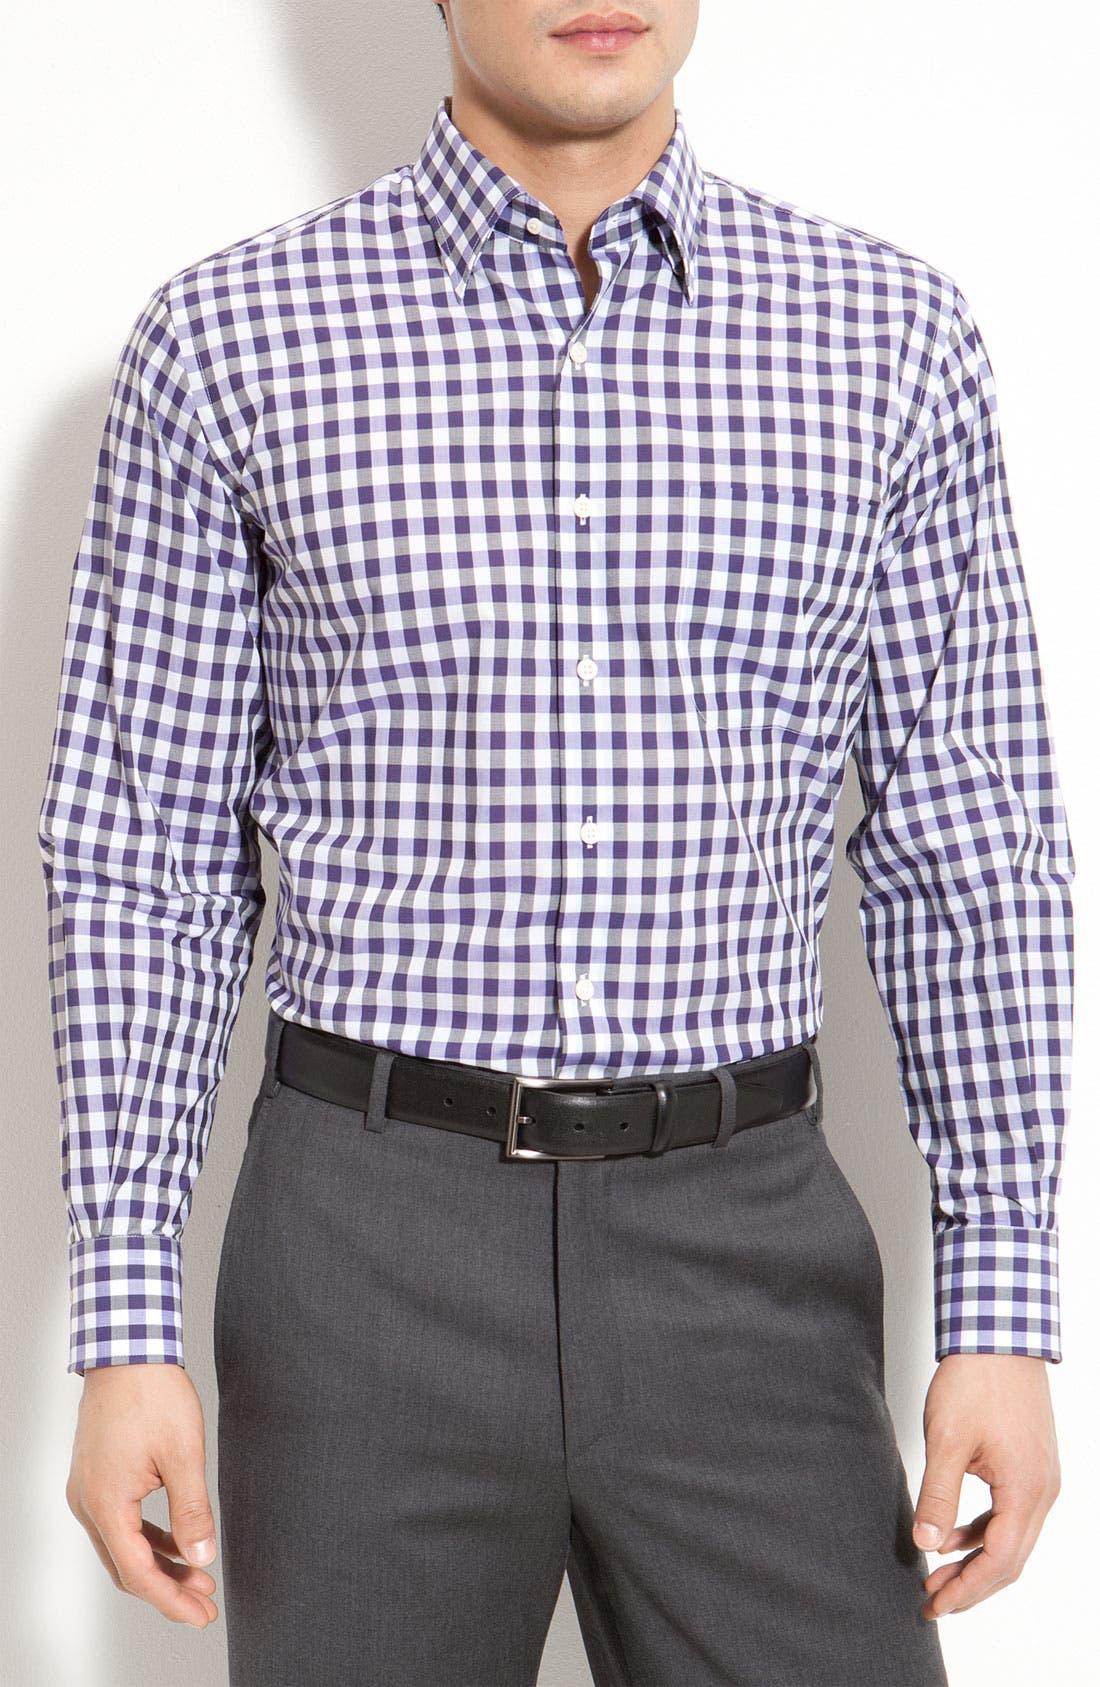 Alternate Image 1 Selected - Peter Millar 'Hombre Plaid' Sport Shirt